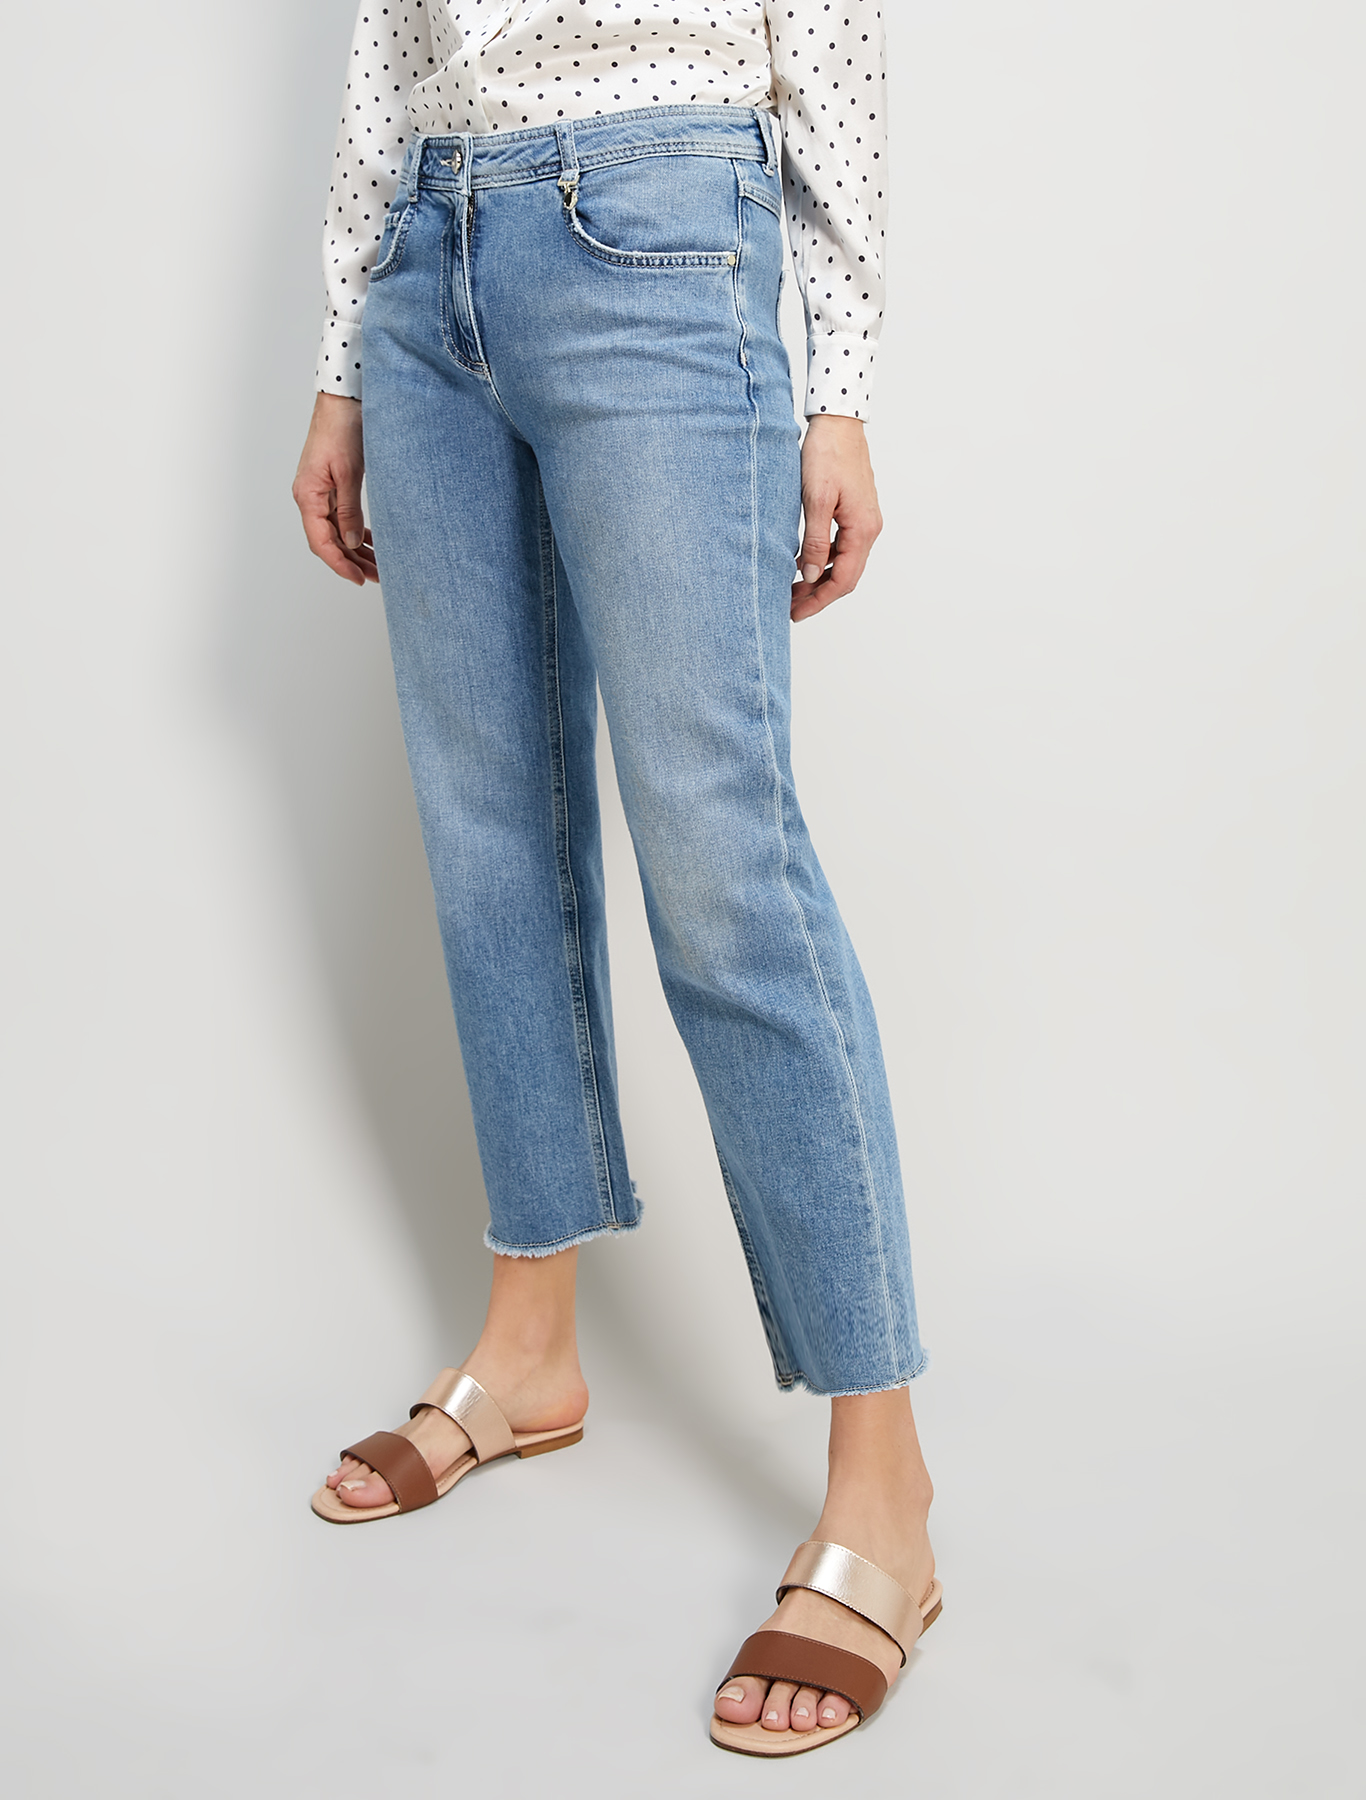 Kick-flare jeans - cornflower blue - pennyblack